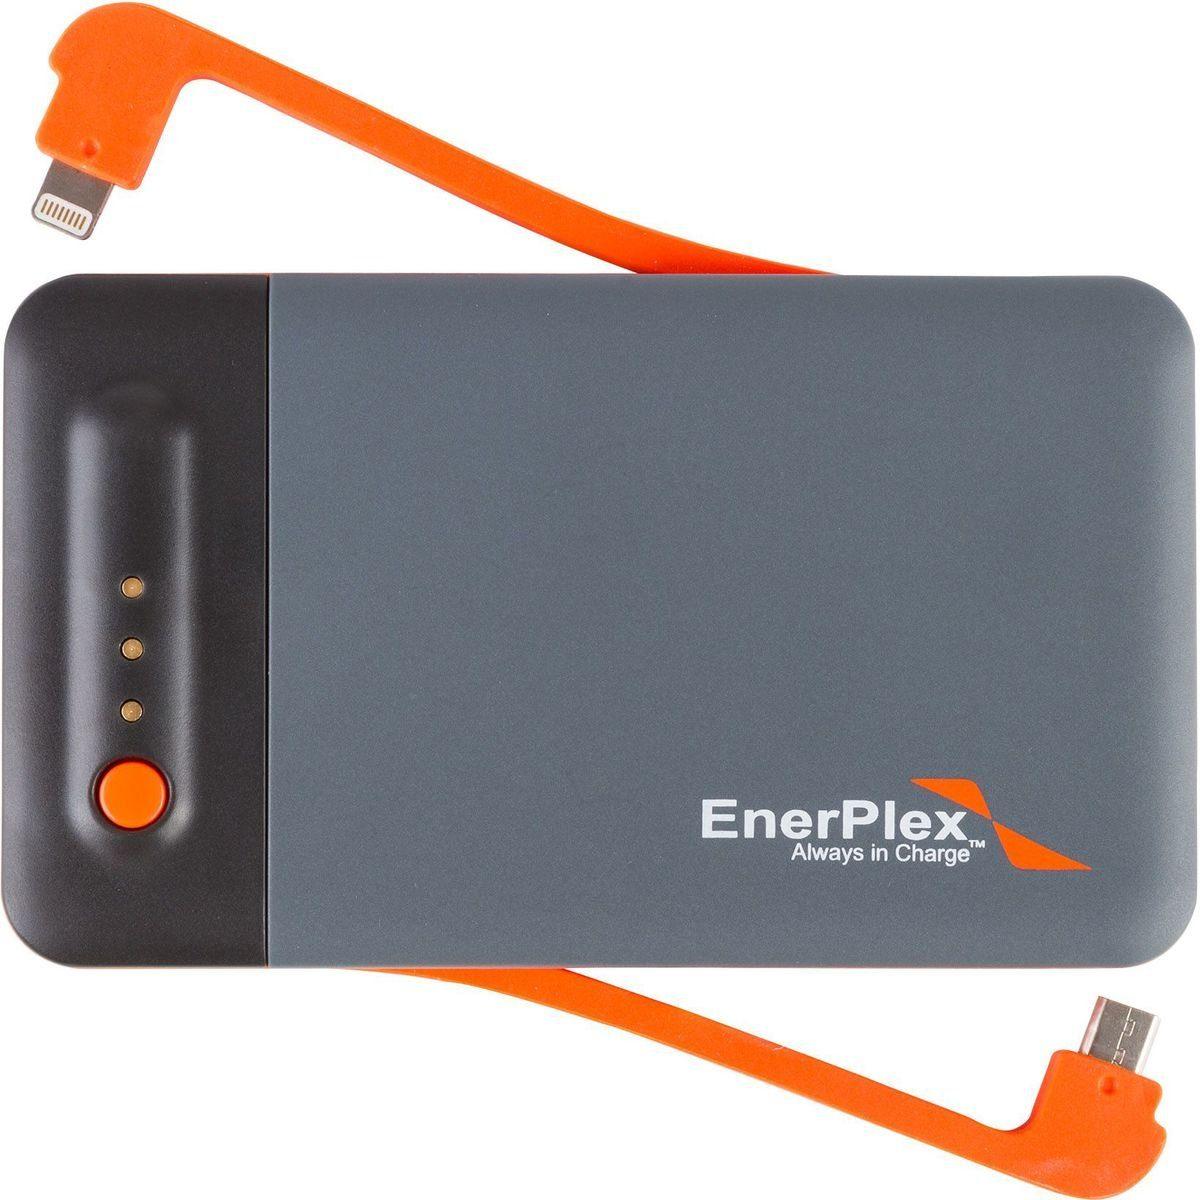 Enerplex Mobile Power »Jumpr Stack 6 - Powerpack (6.000 mAh)«